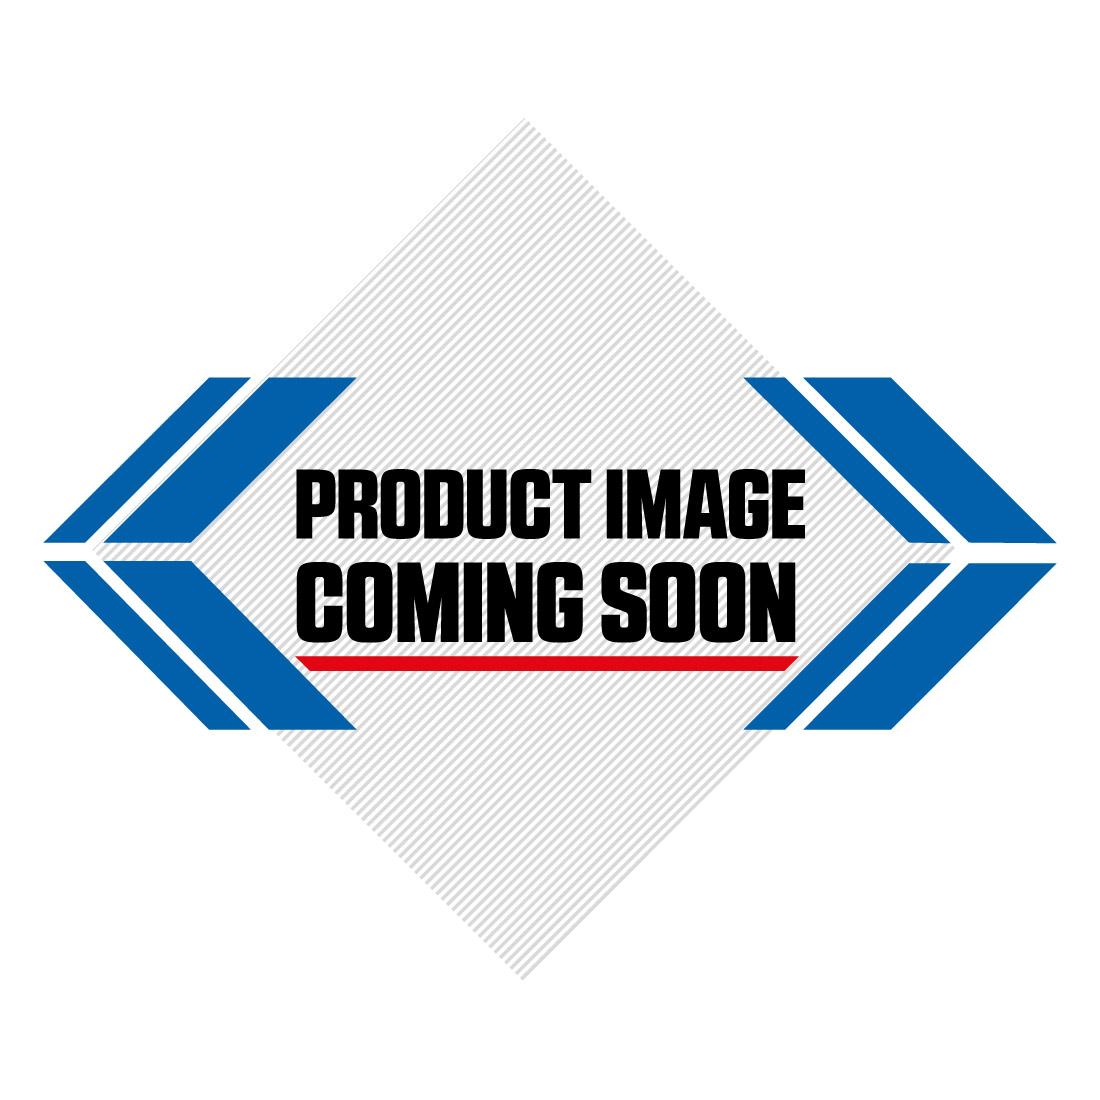 Kawasaki Restyled Plastic Kit KX 85 (01-09) (11-12) OEM Factory Image-1>